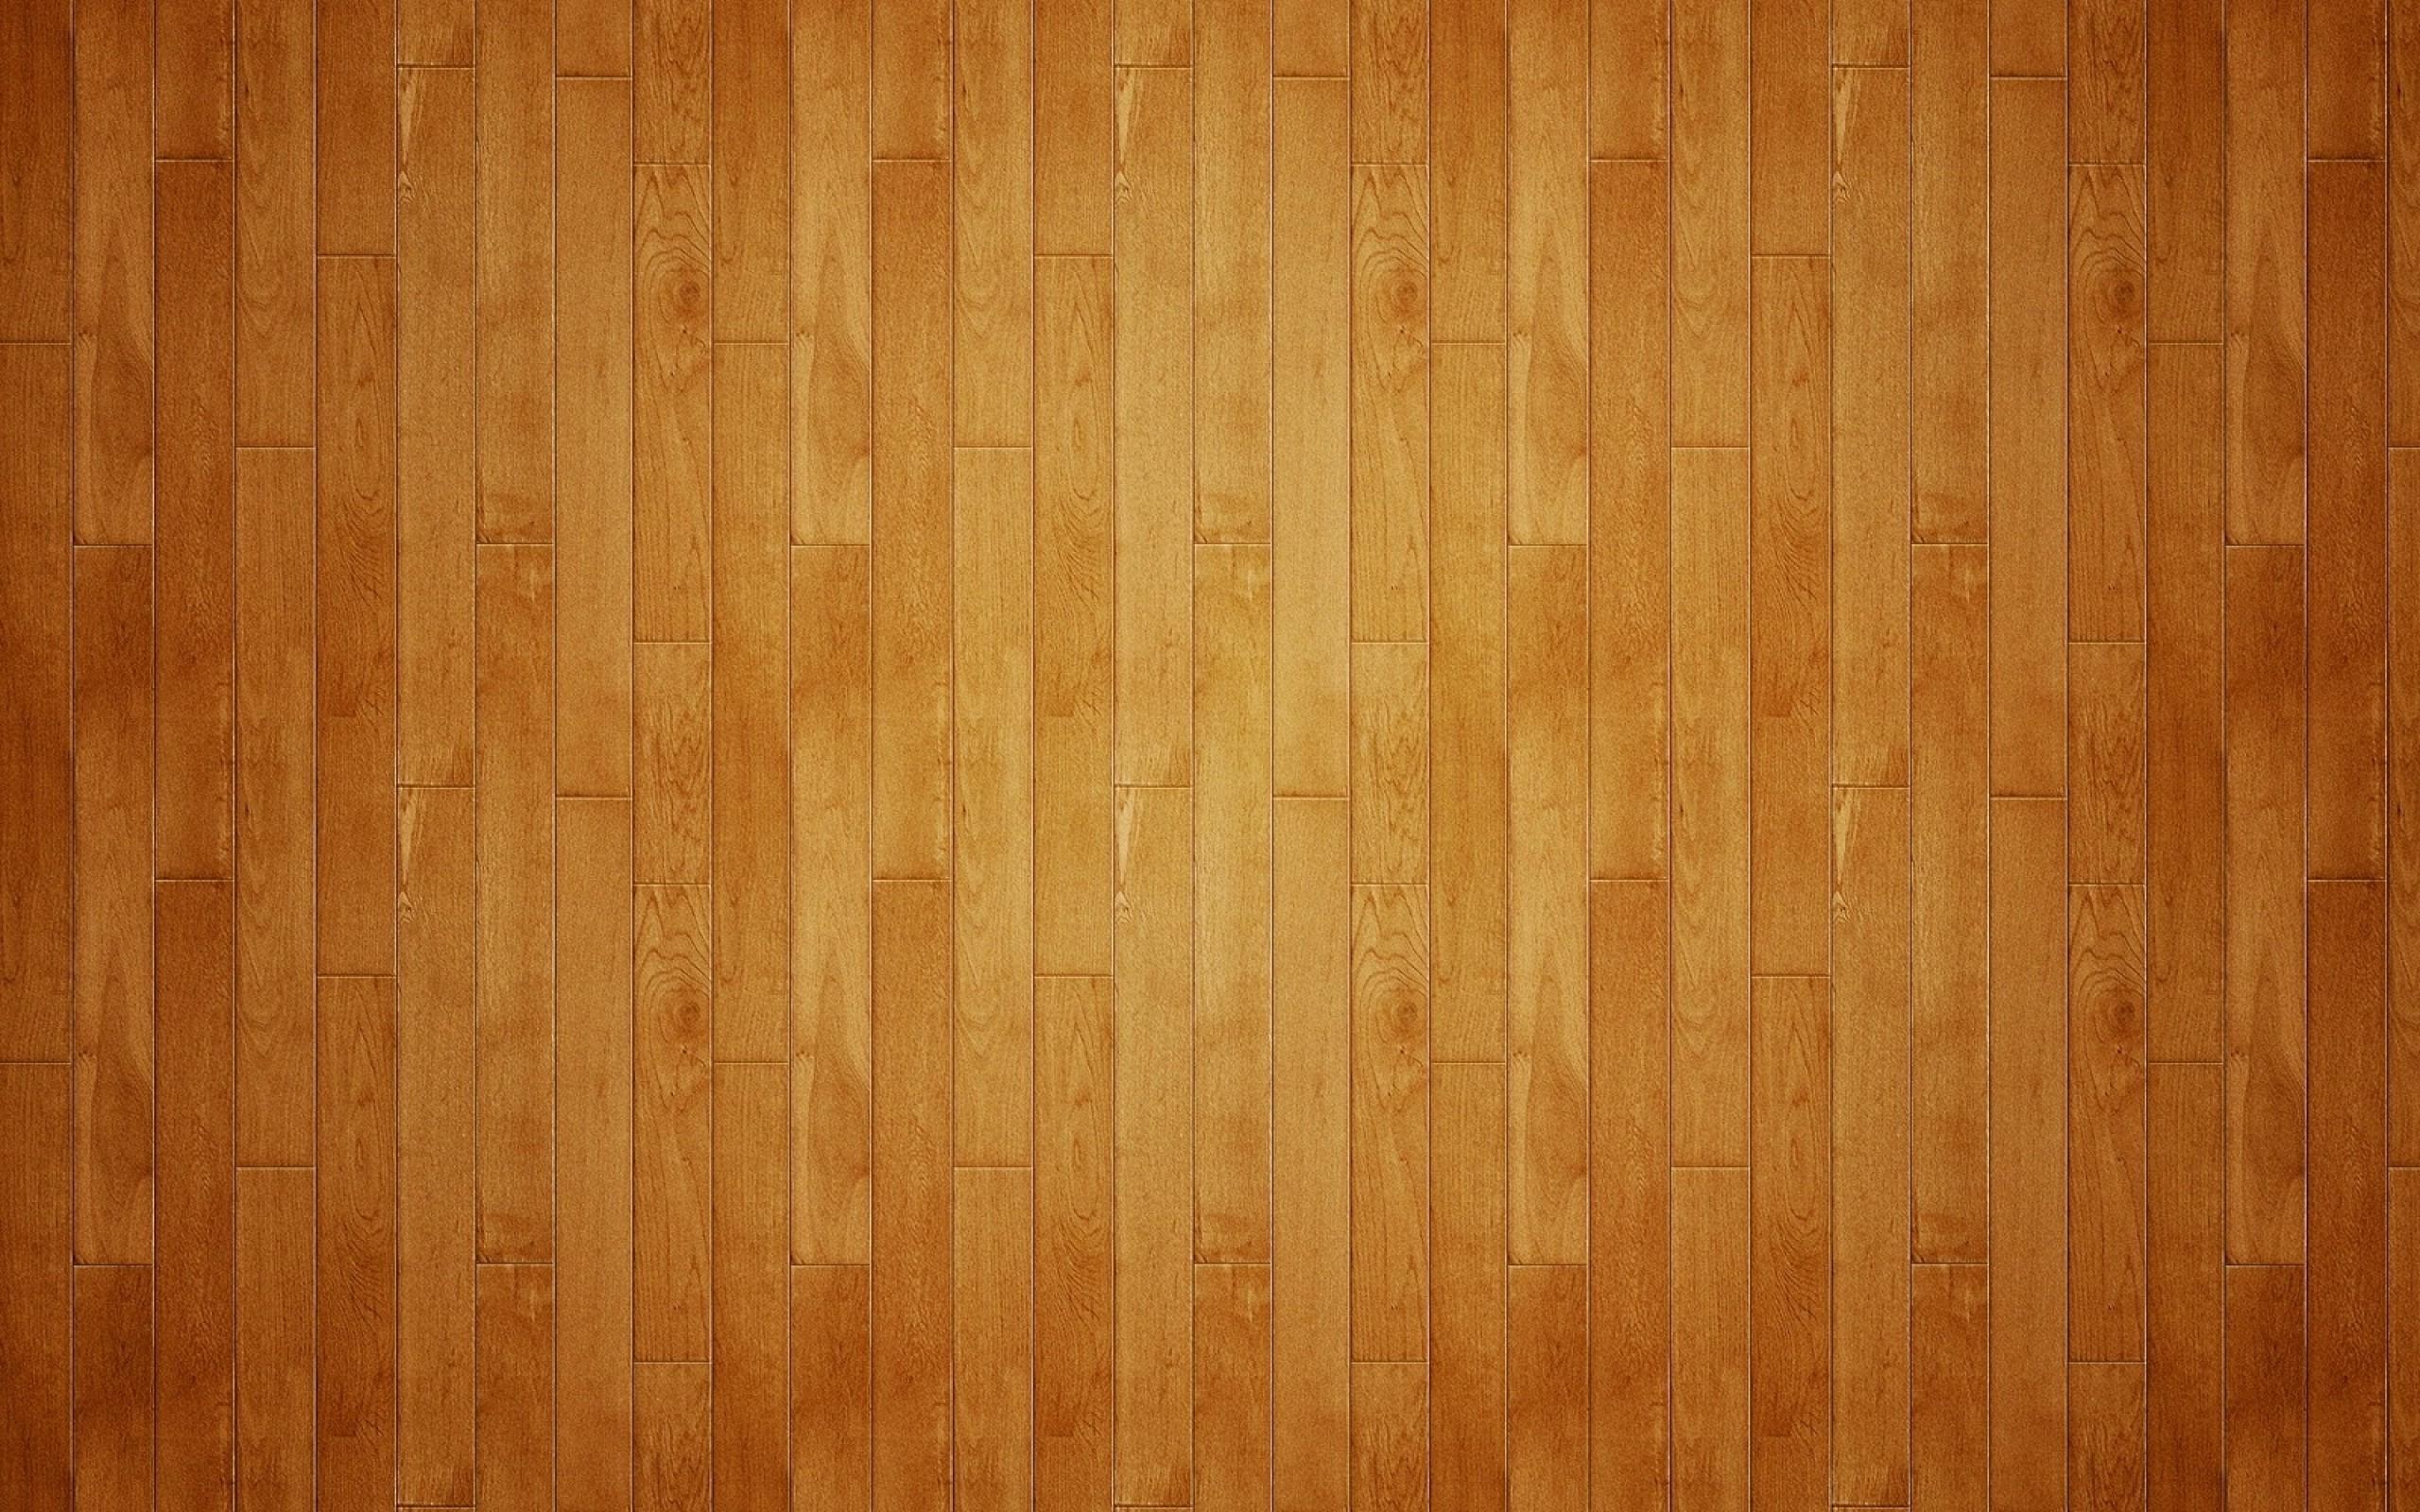 2560x1920 Ultra HD K Wood Wallpapers Desktop Backgrounds X